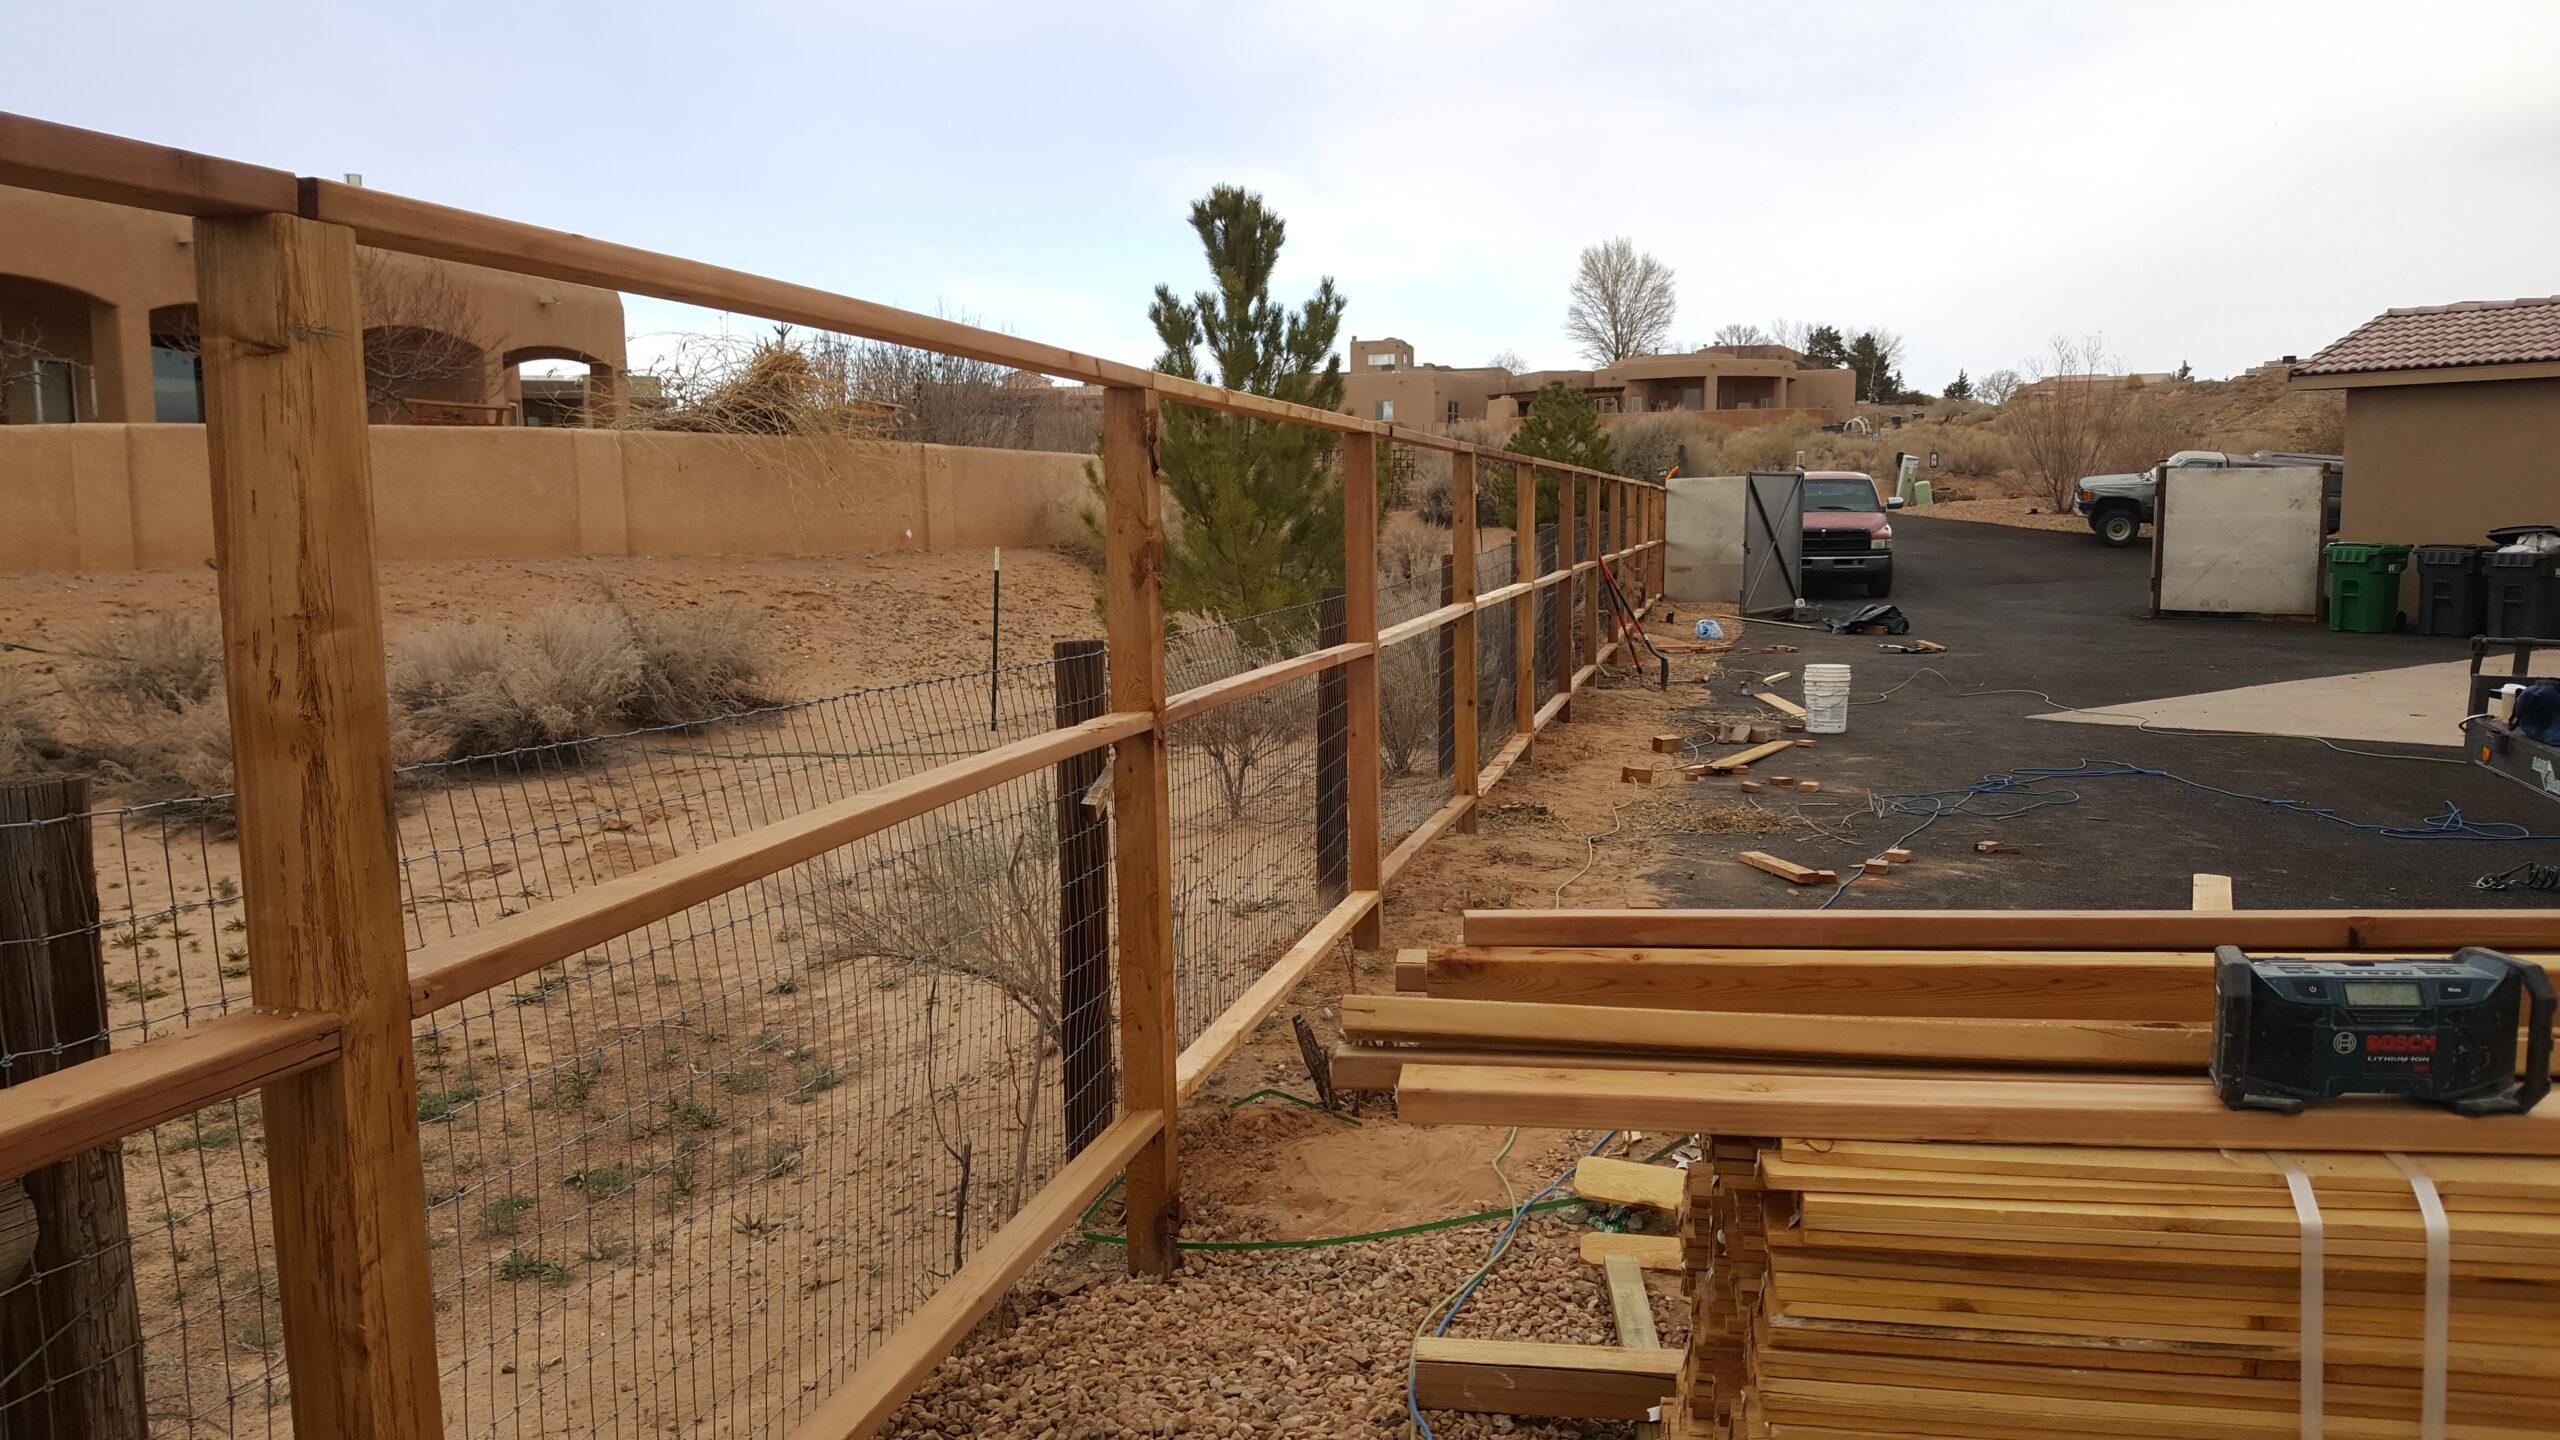 image showing cedar fence